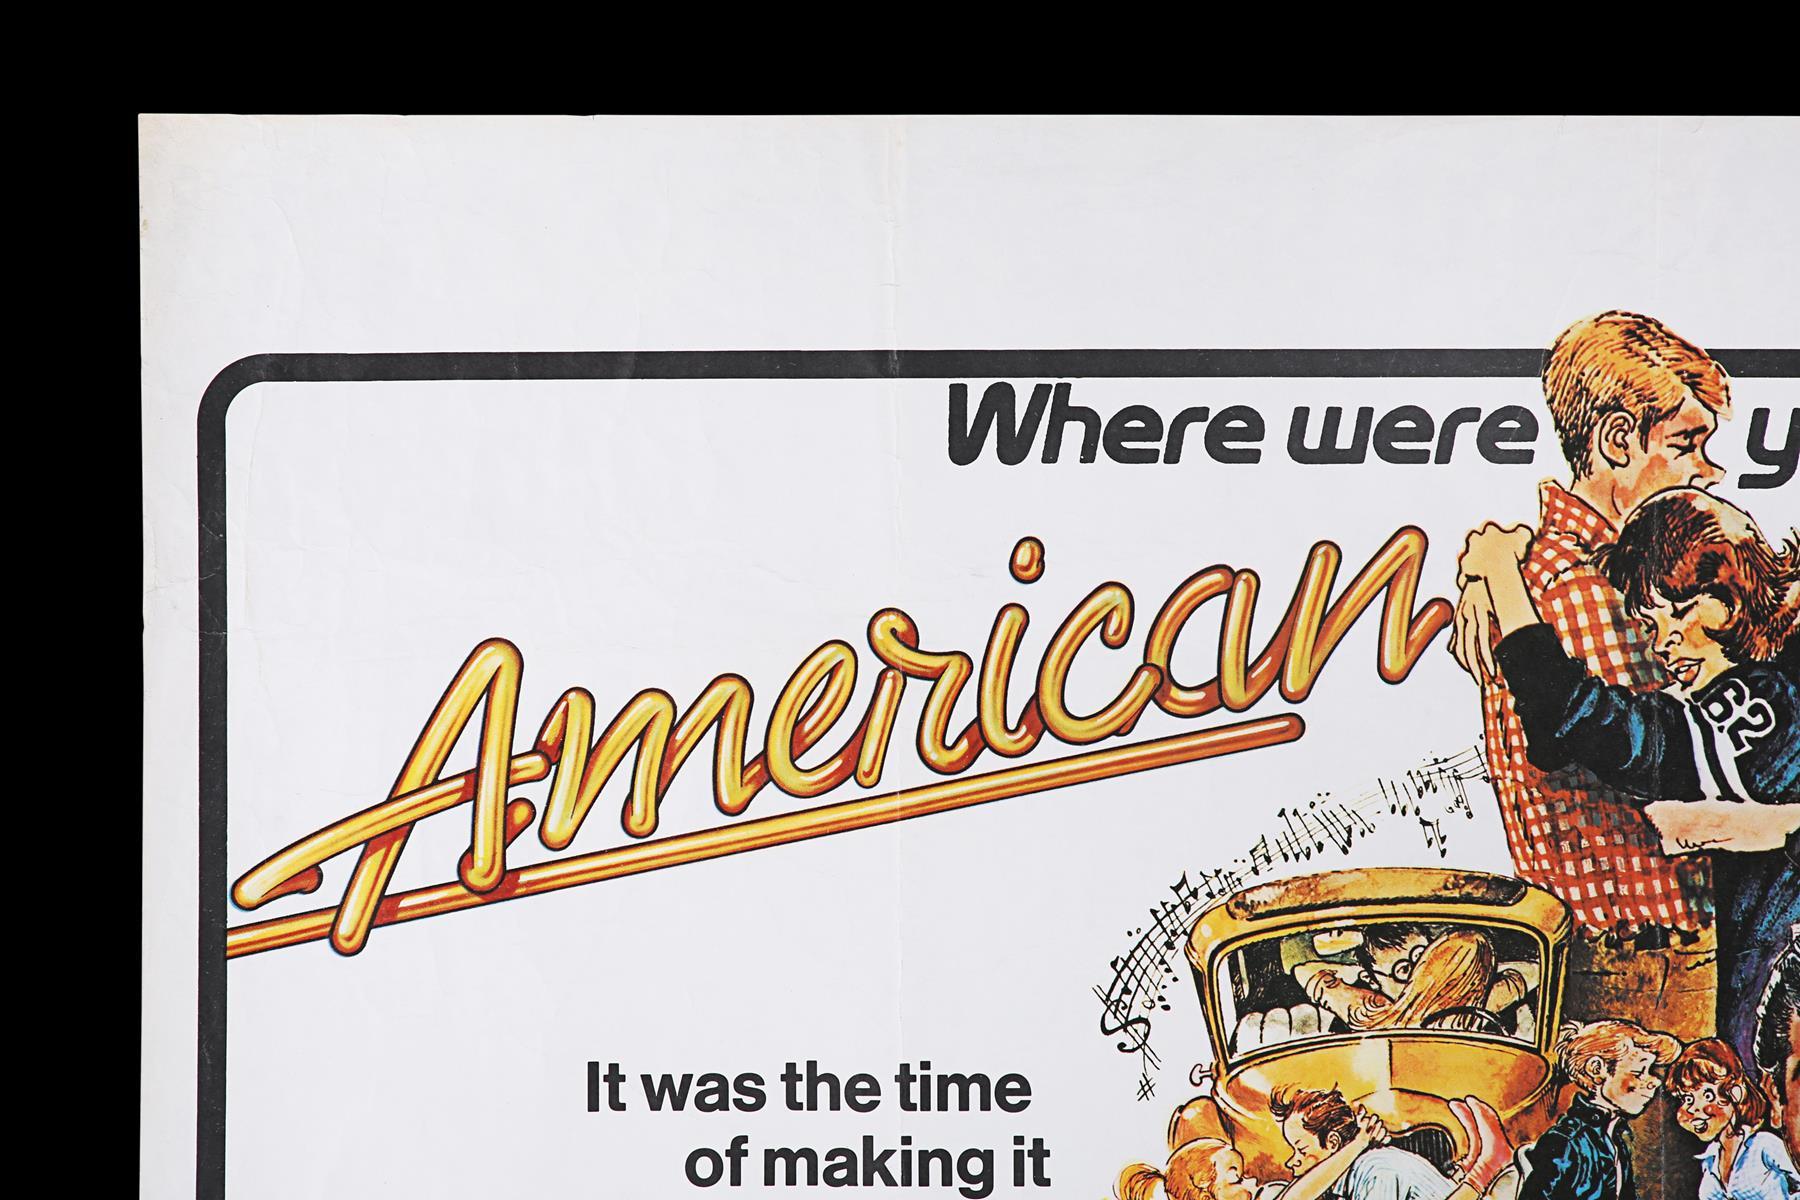 AMERICAN GRAFFITI (1973) - UK Quad, 1973 - Image 2 of 6